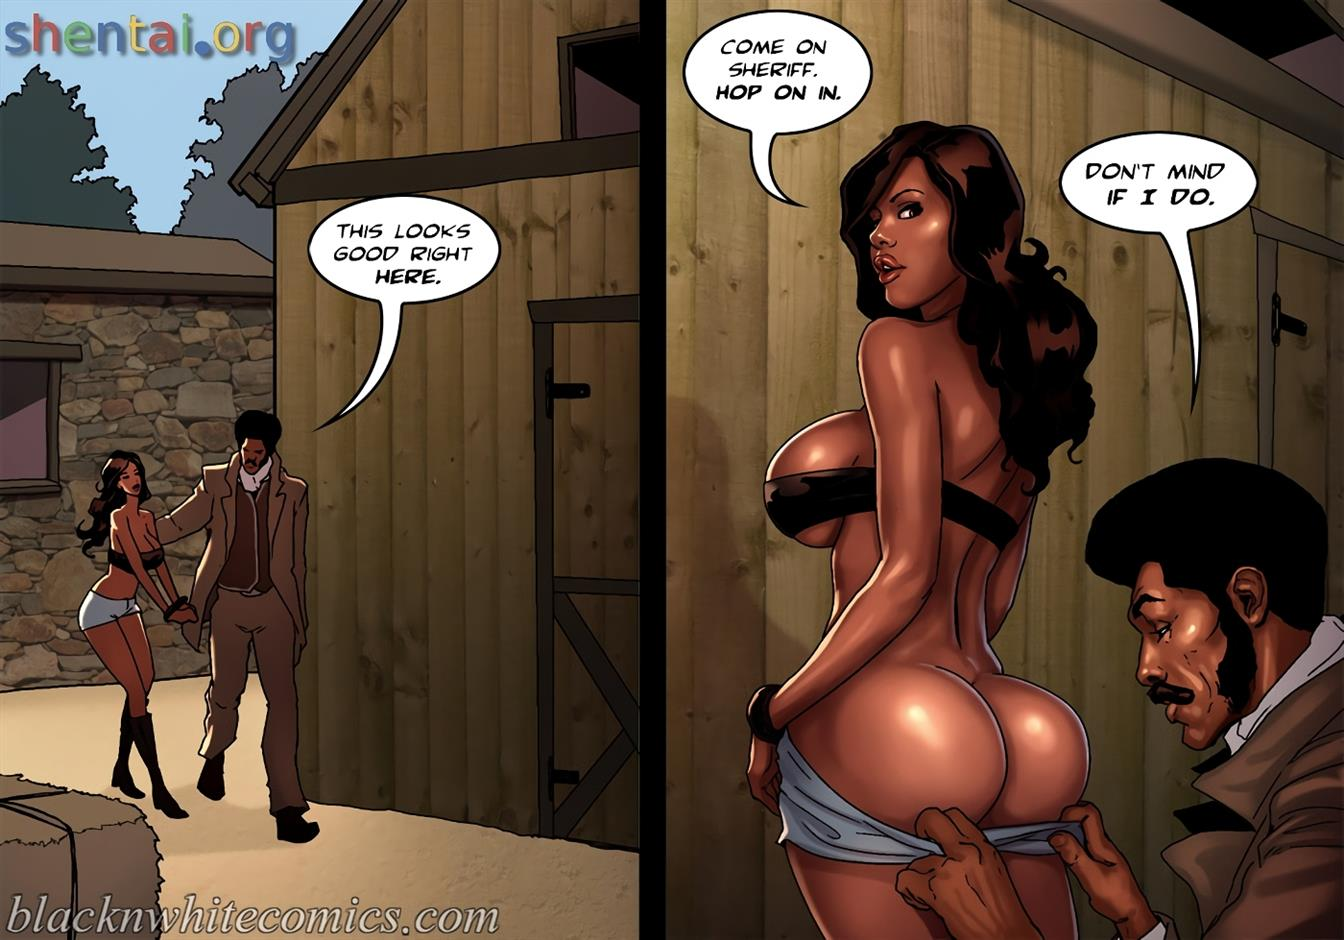 True Dick [BlackNwhite] - Foto 151